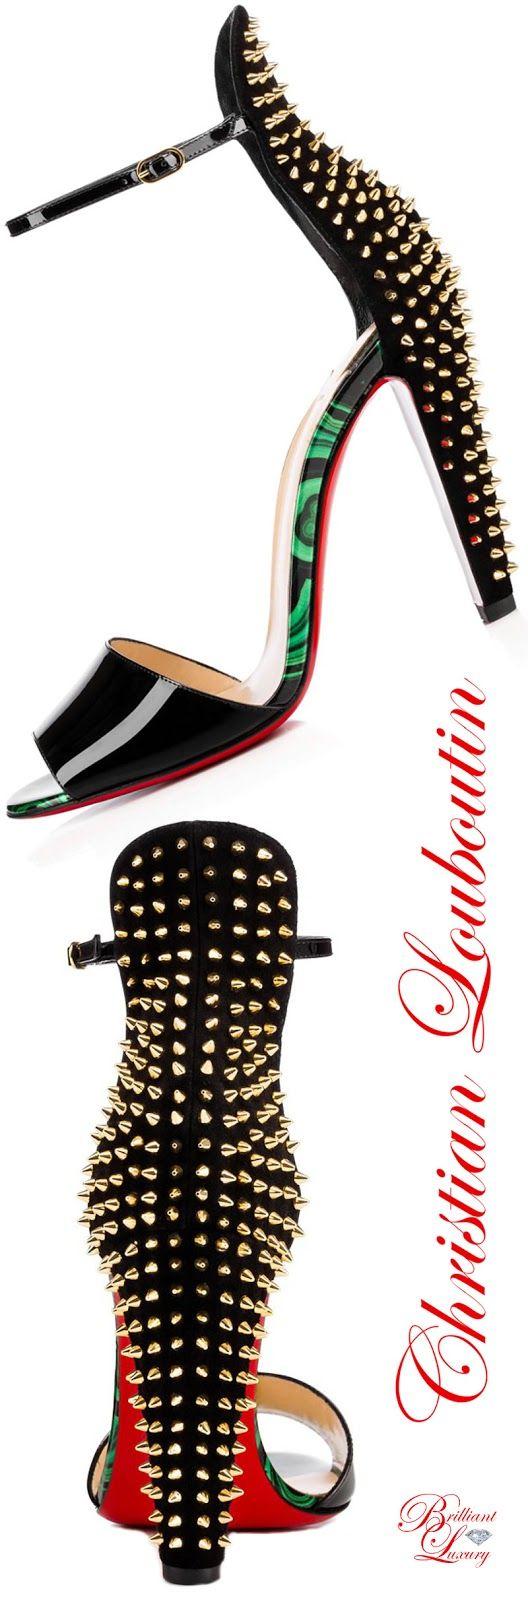 Brilliant Luxury by Emmy DE * Christian Louboutin Tropanita Vernis Sandals